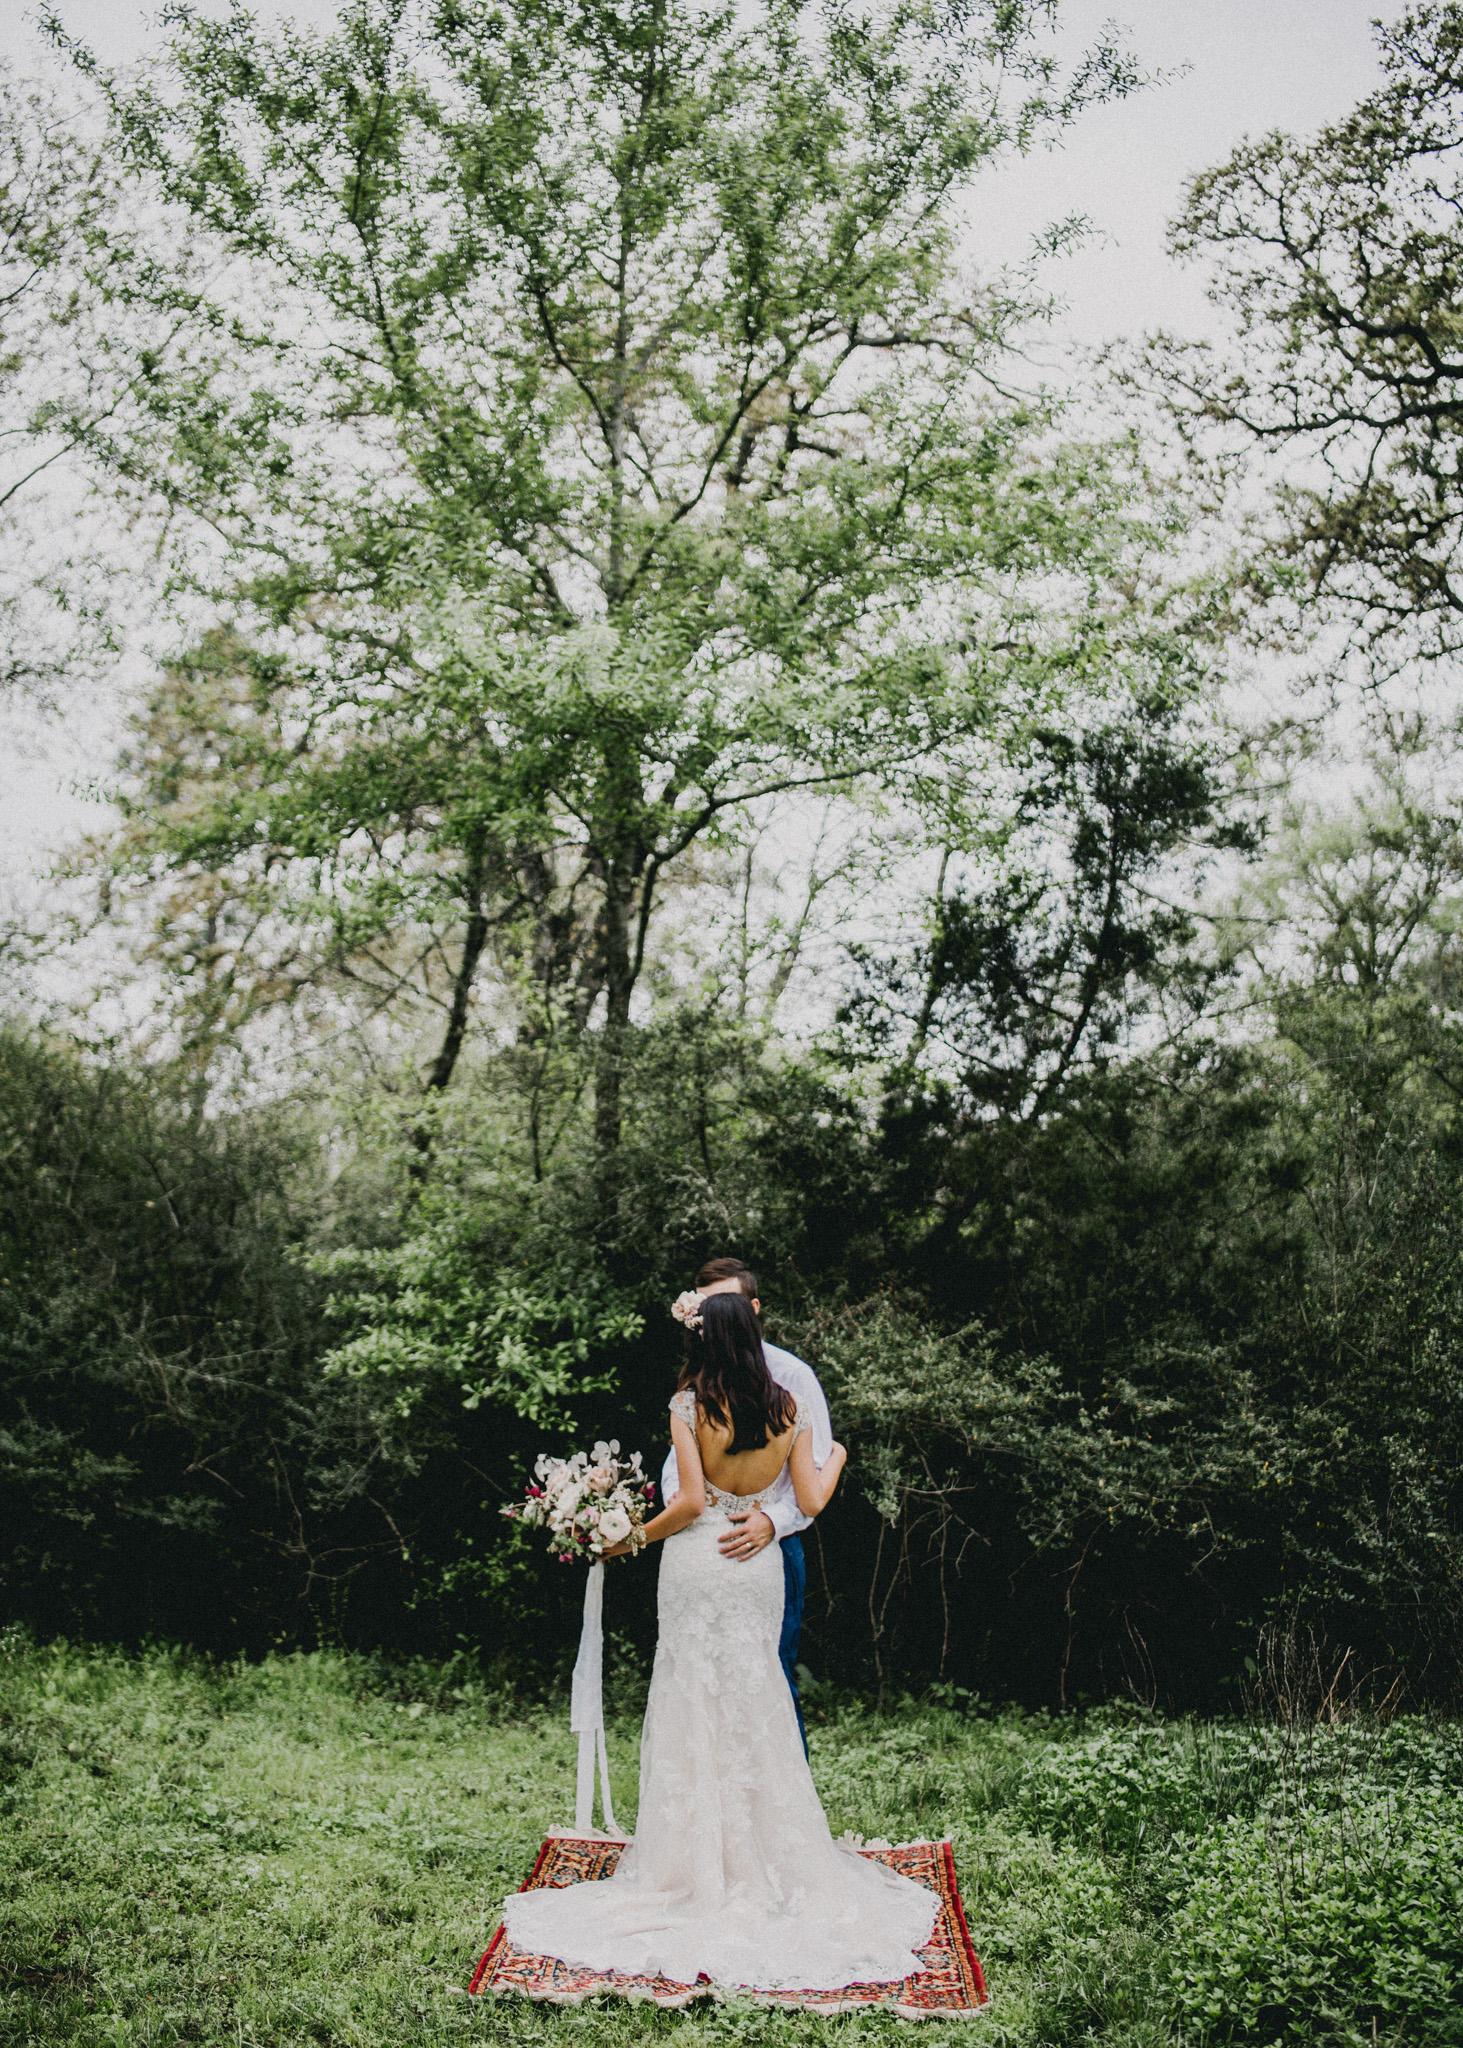 Breshears After Bridal Session Blog-7.jpg